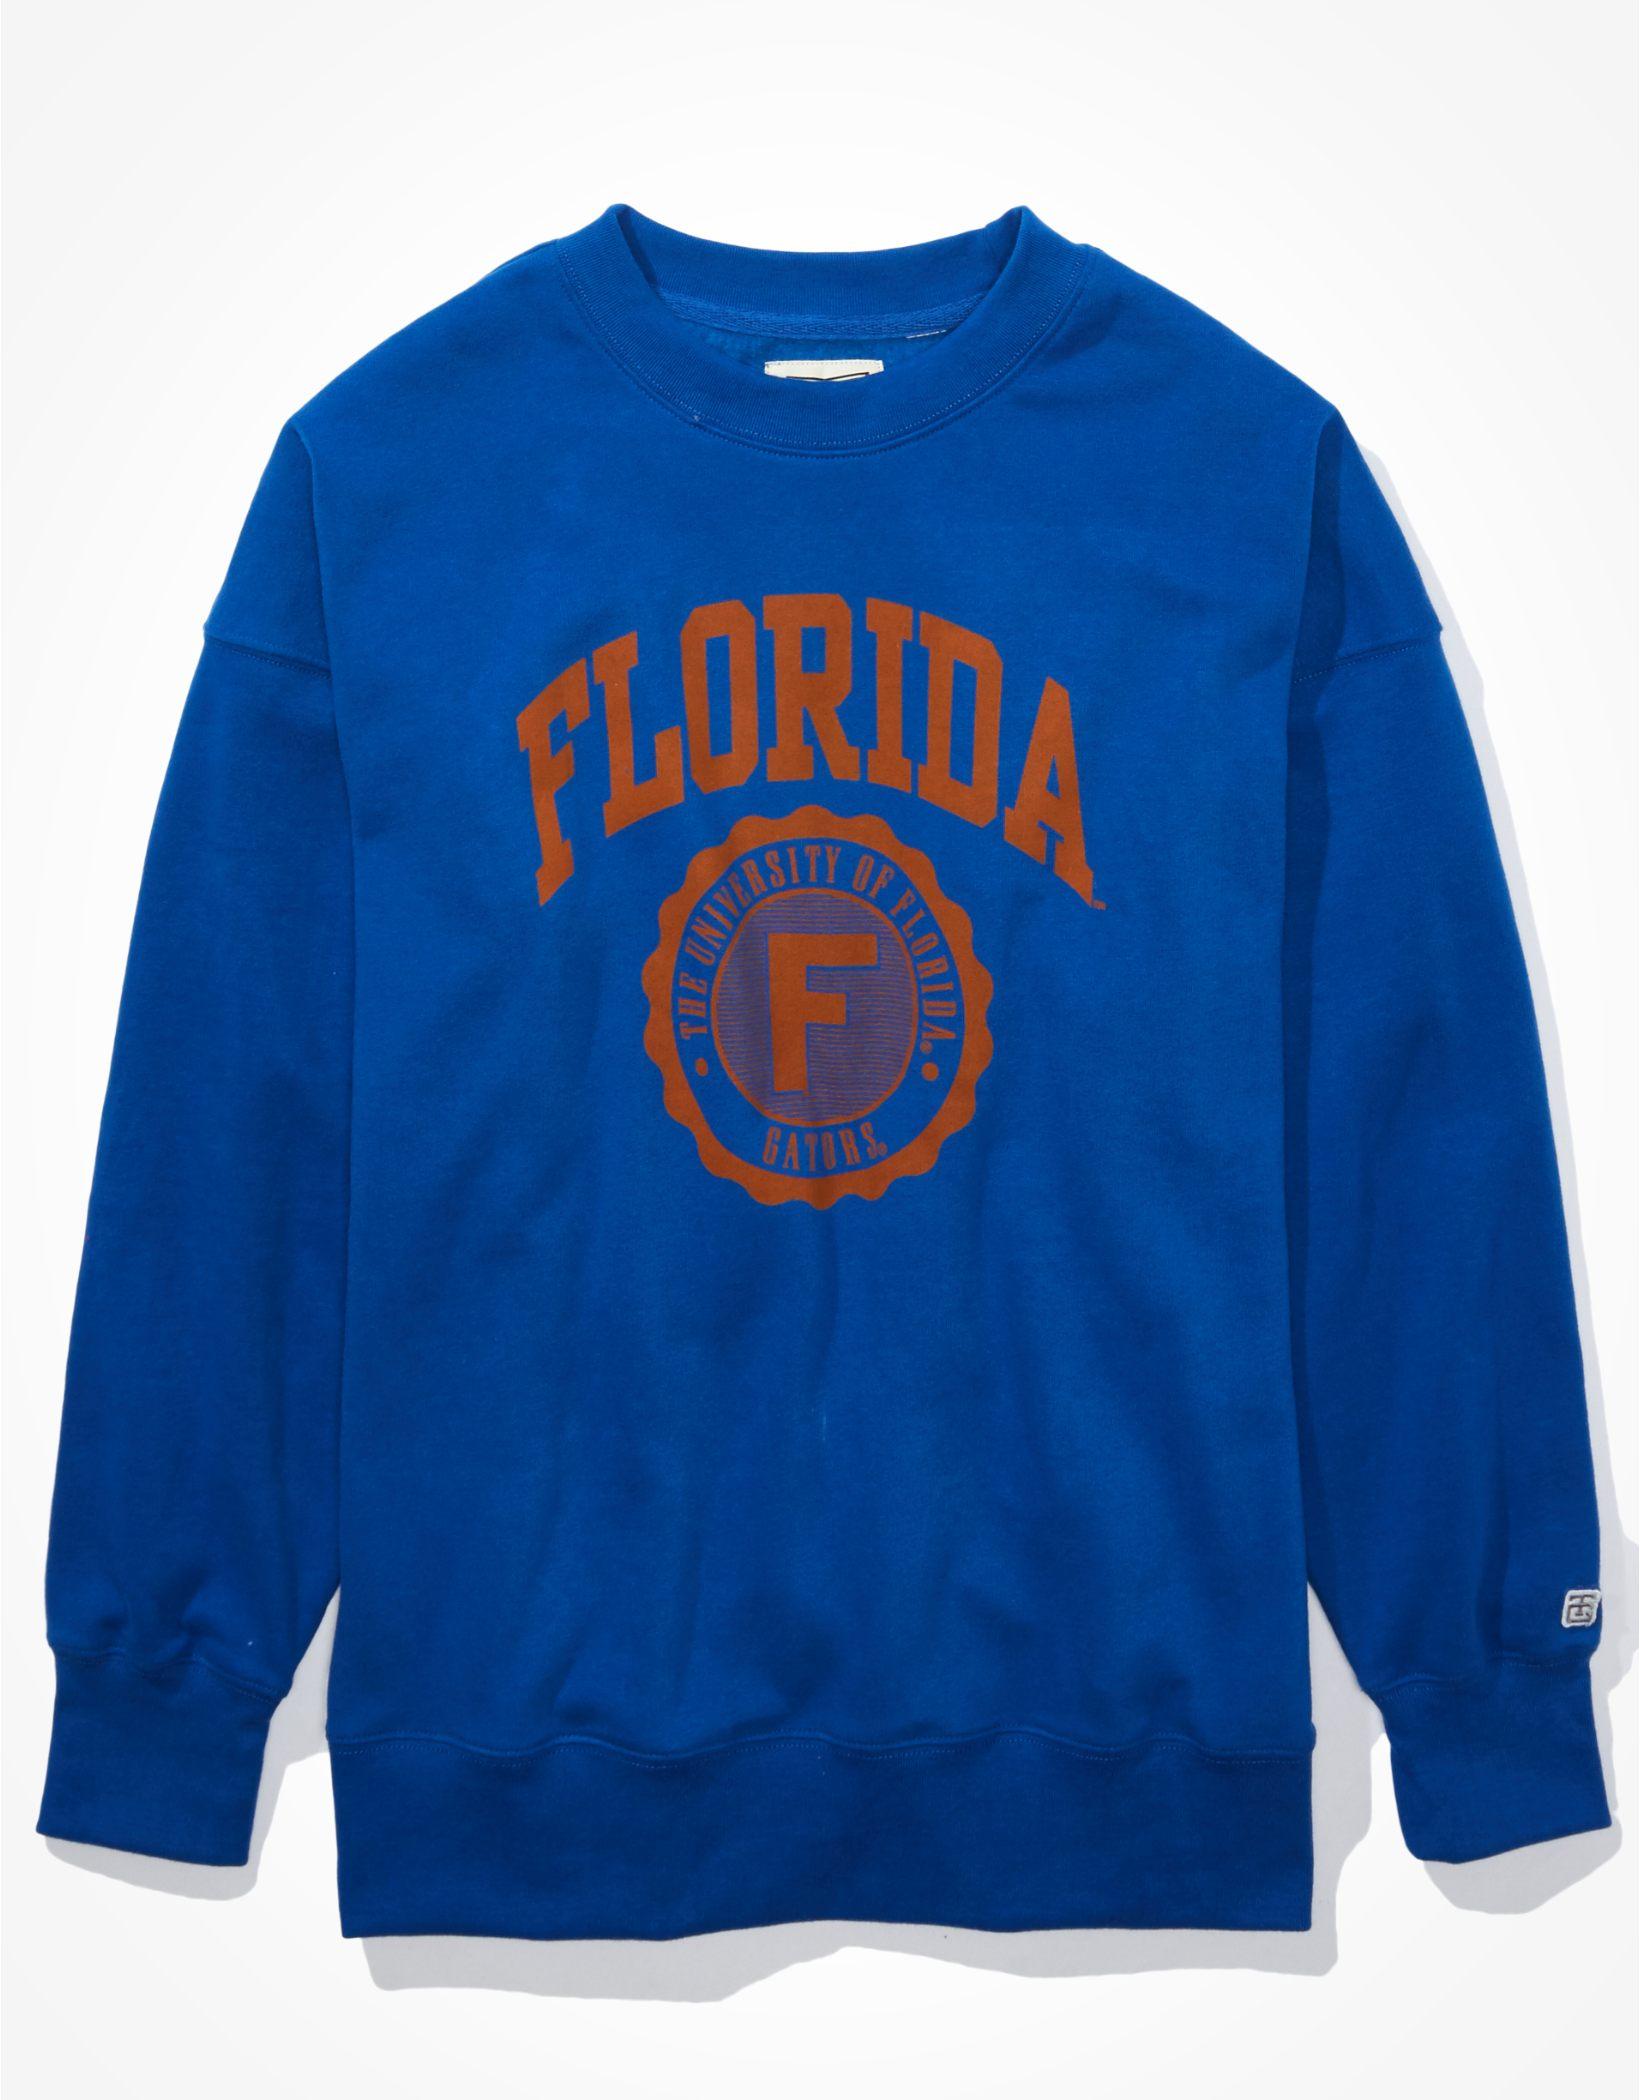 Tailgate Women's Florida Gators Oversized Sweatshirt